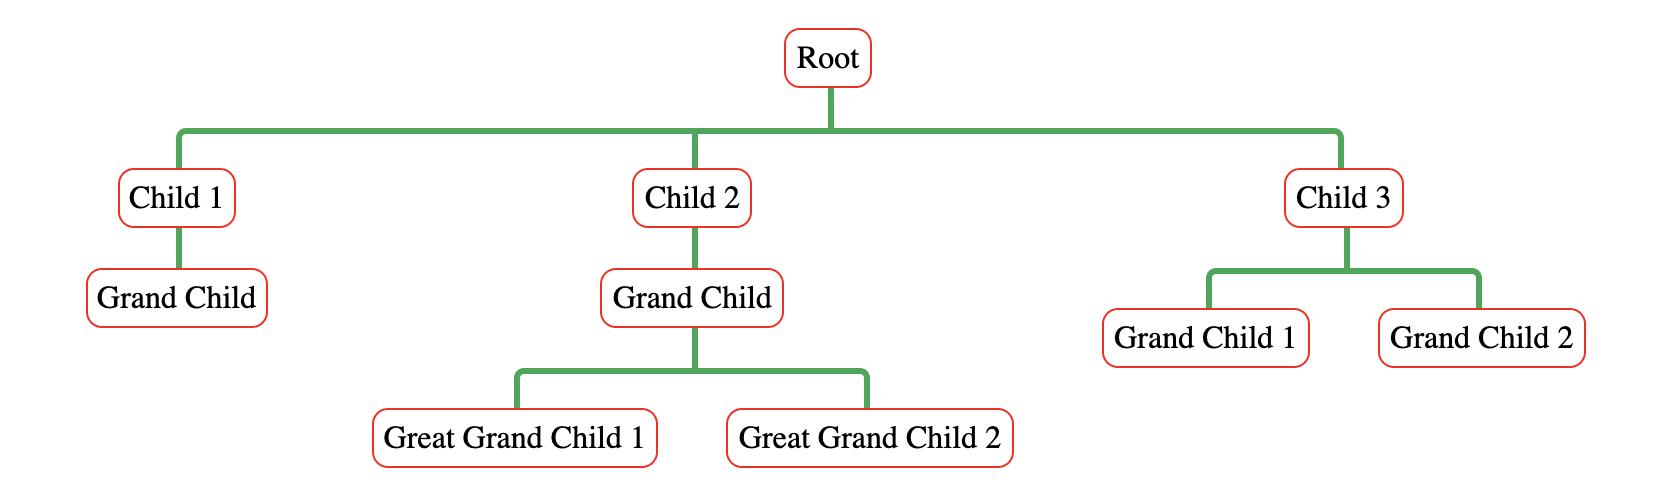 styled tree example